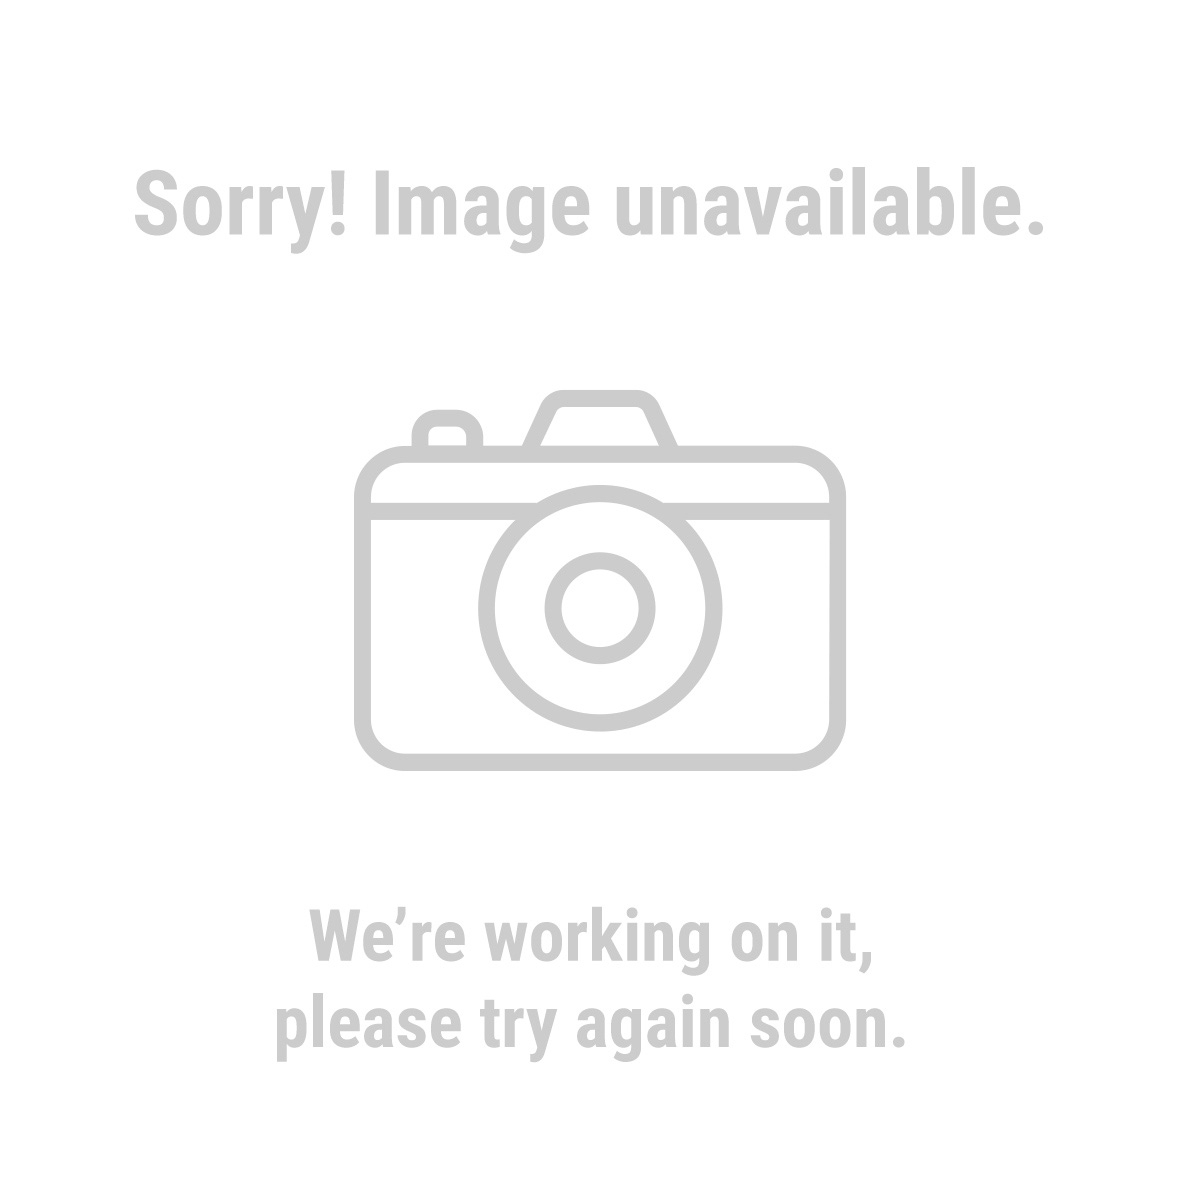 Pittsburgh Automotive 61406 2 Ton Aluminum Racing Floor Jack with RapidPump®